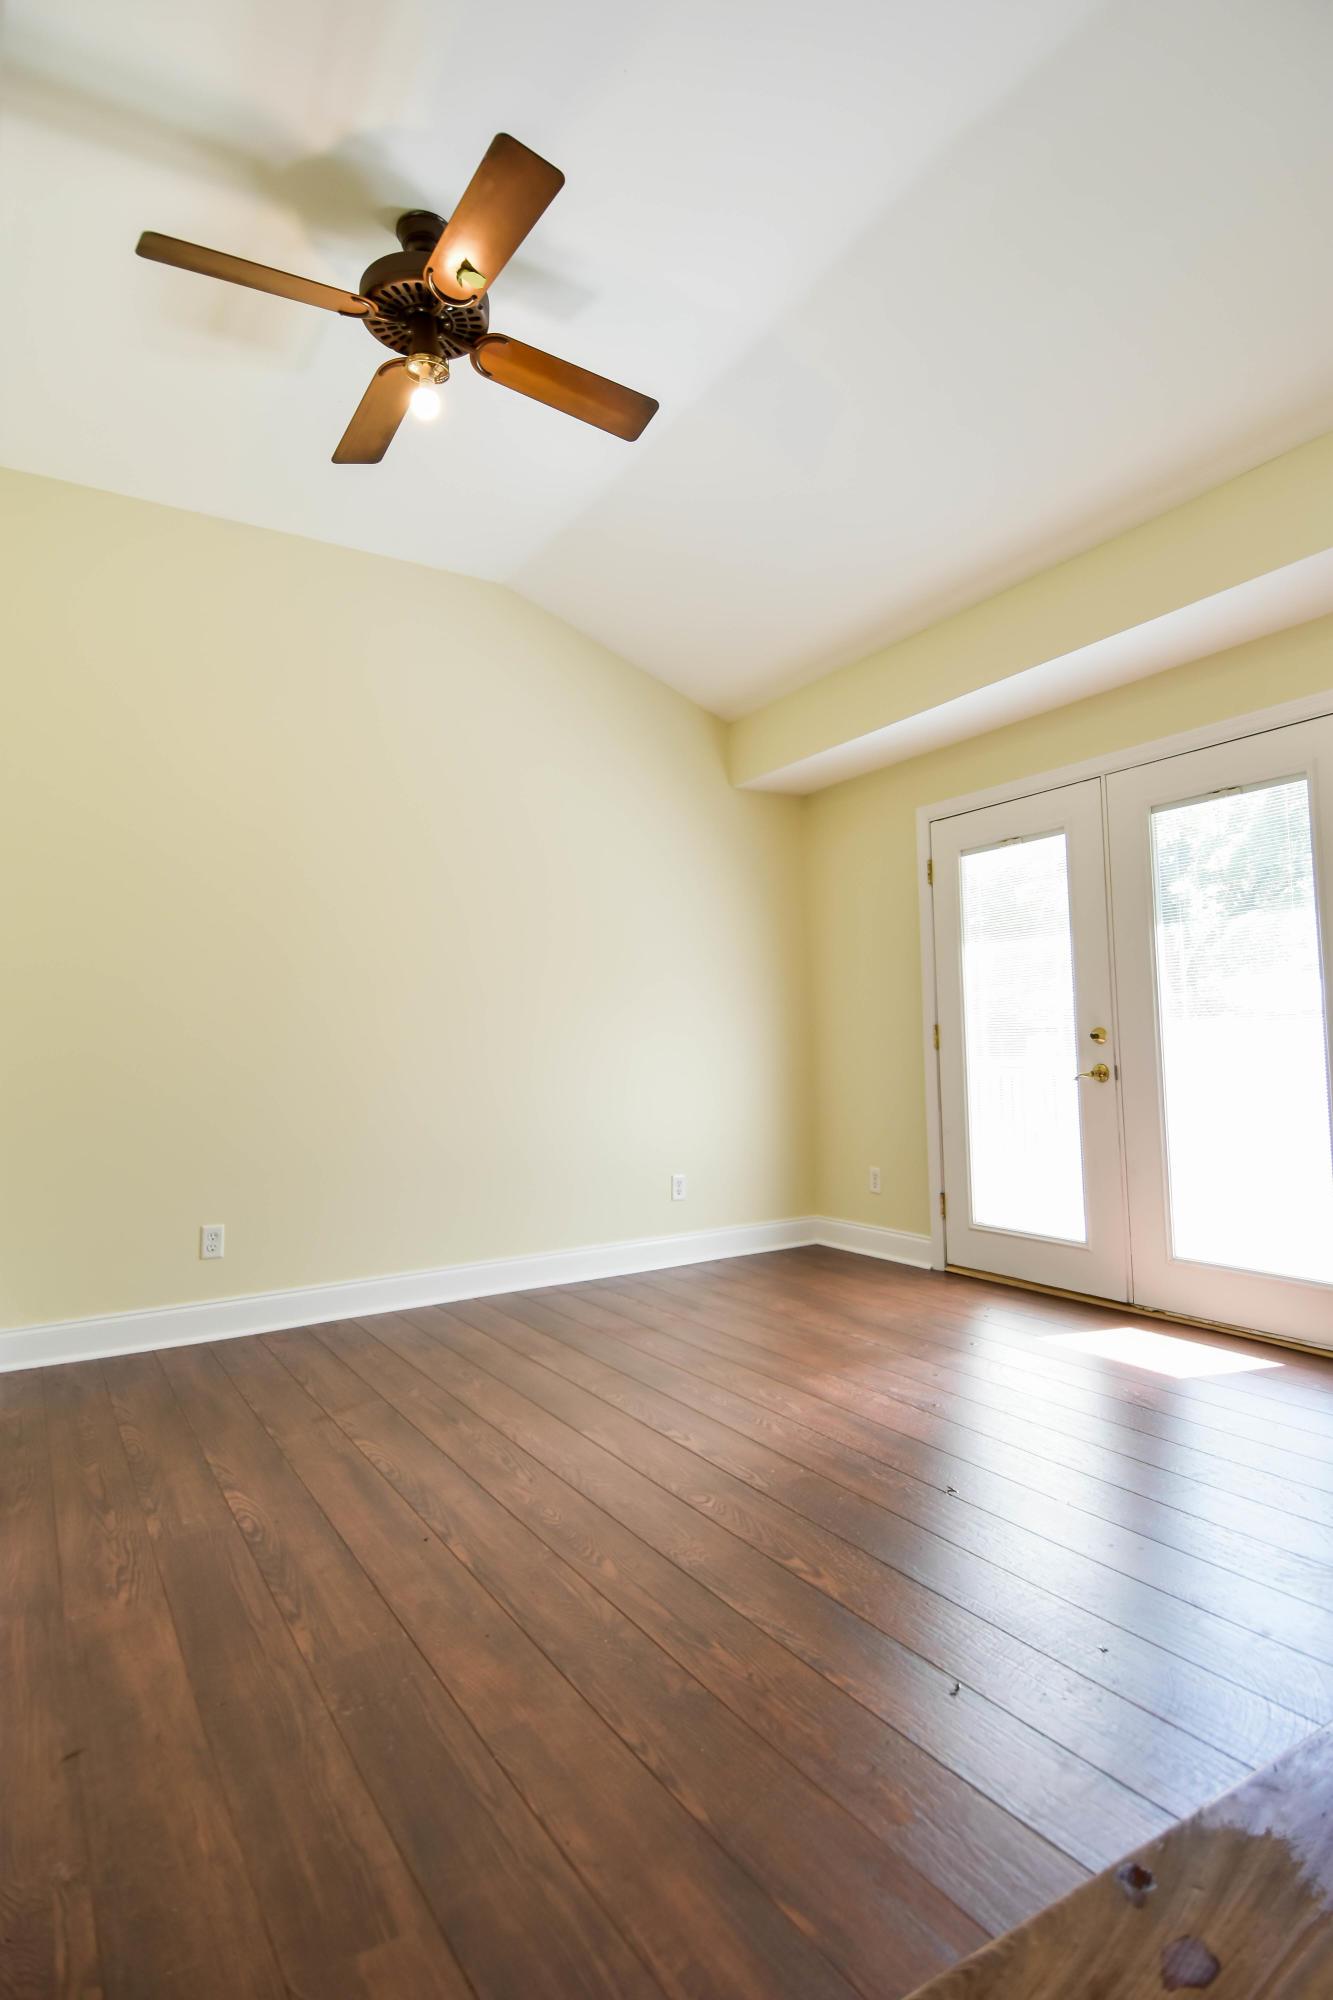 Jasper Terrace Homes For Sale - 1407 Hindman, Mount Pleasant, SC - 9